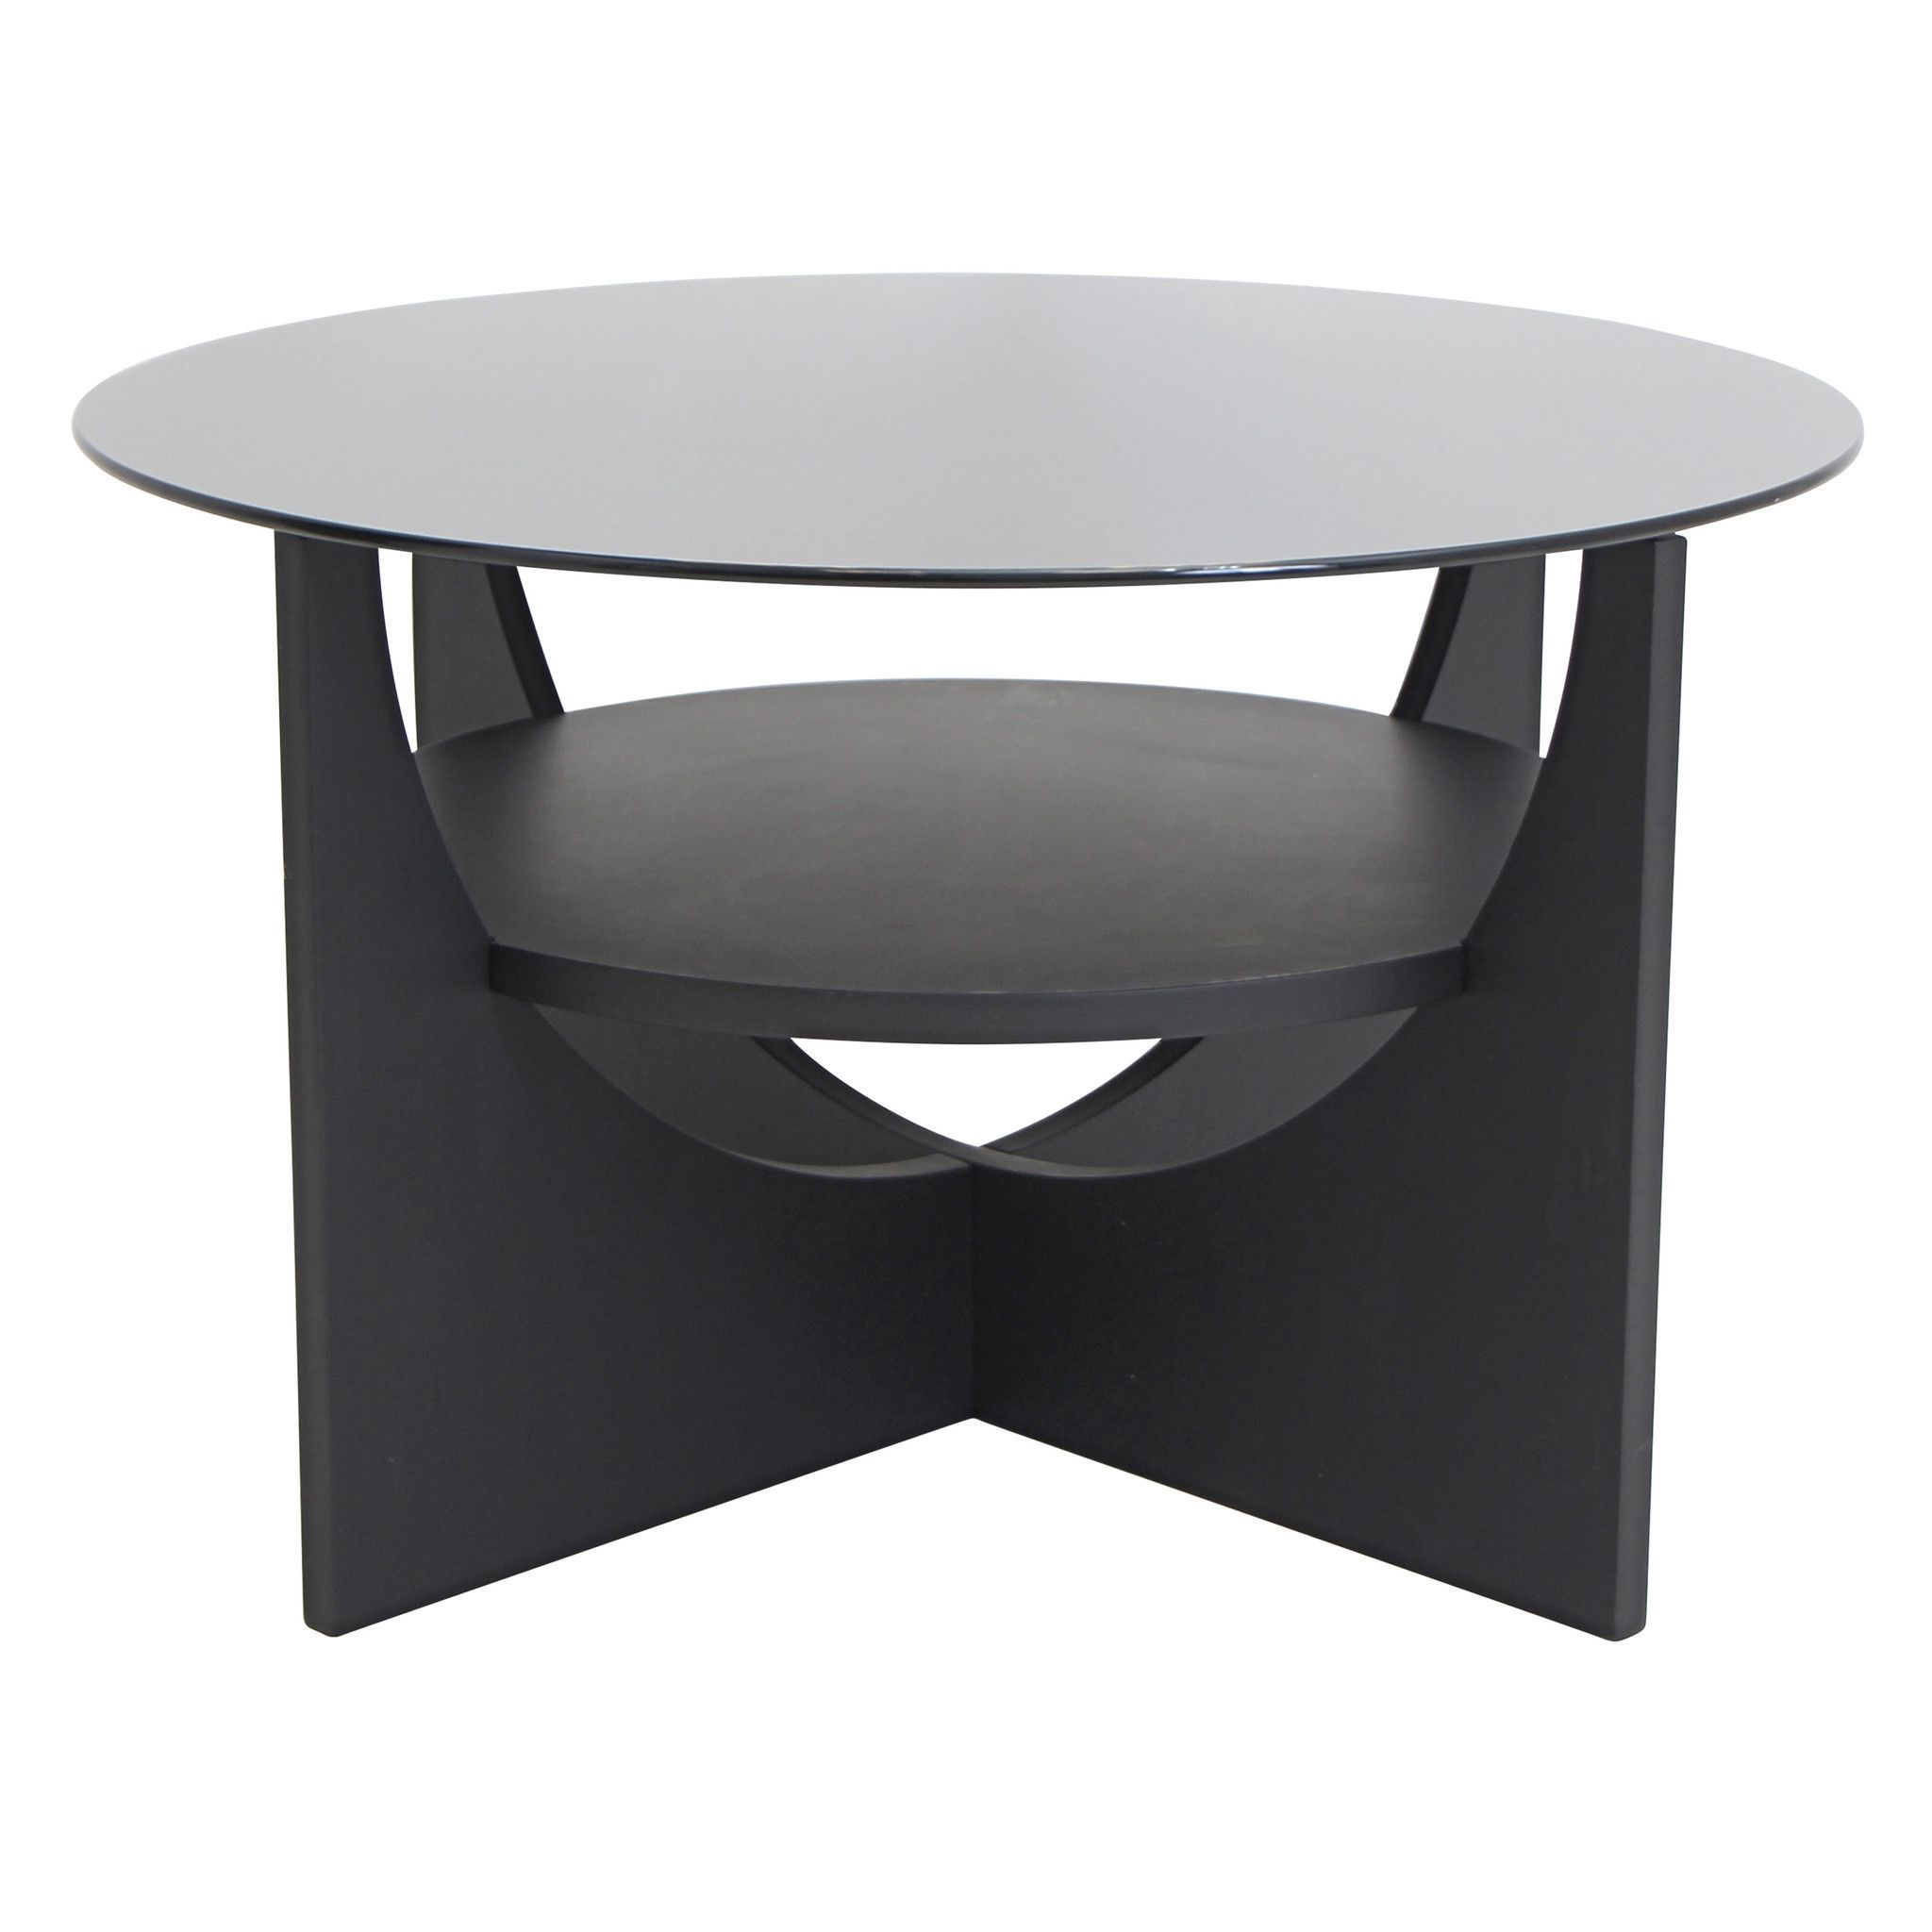 Lumisource U Shaped Coffee Table In 2021 U Shaped Coffee Table Contemporary Coffee Table Coffee Table [ 2048 x 2048 Pixel ]